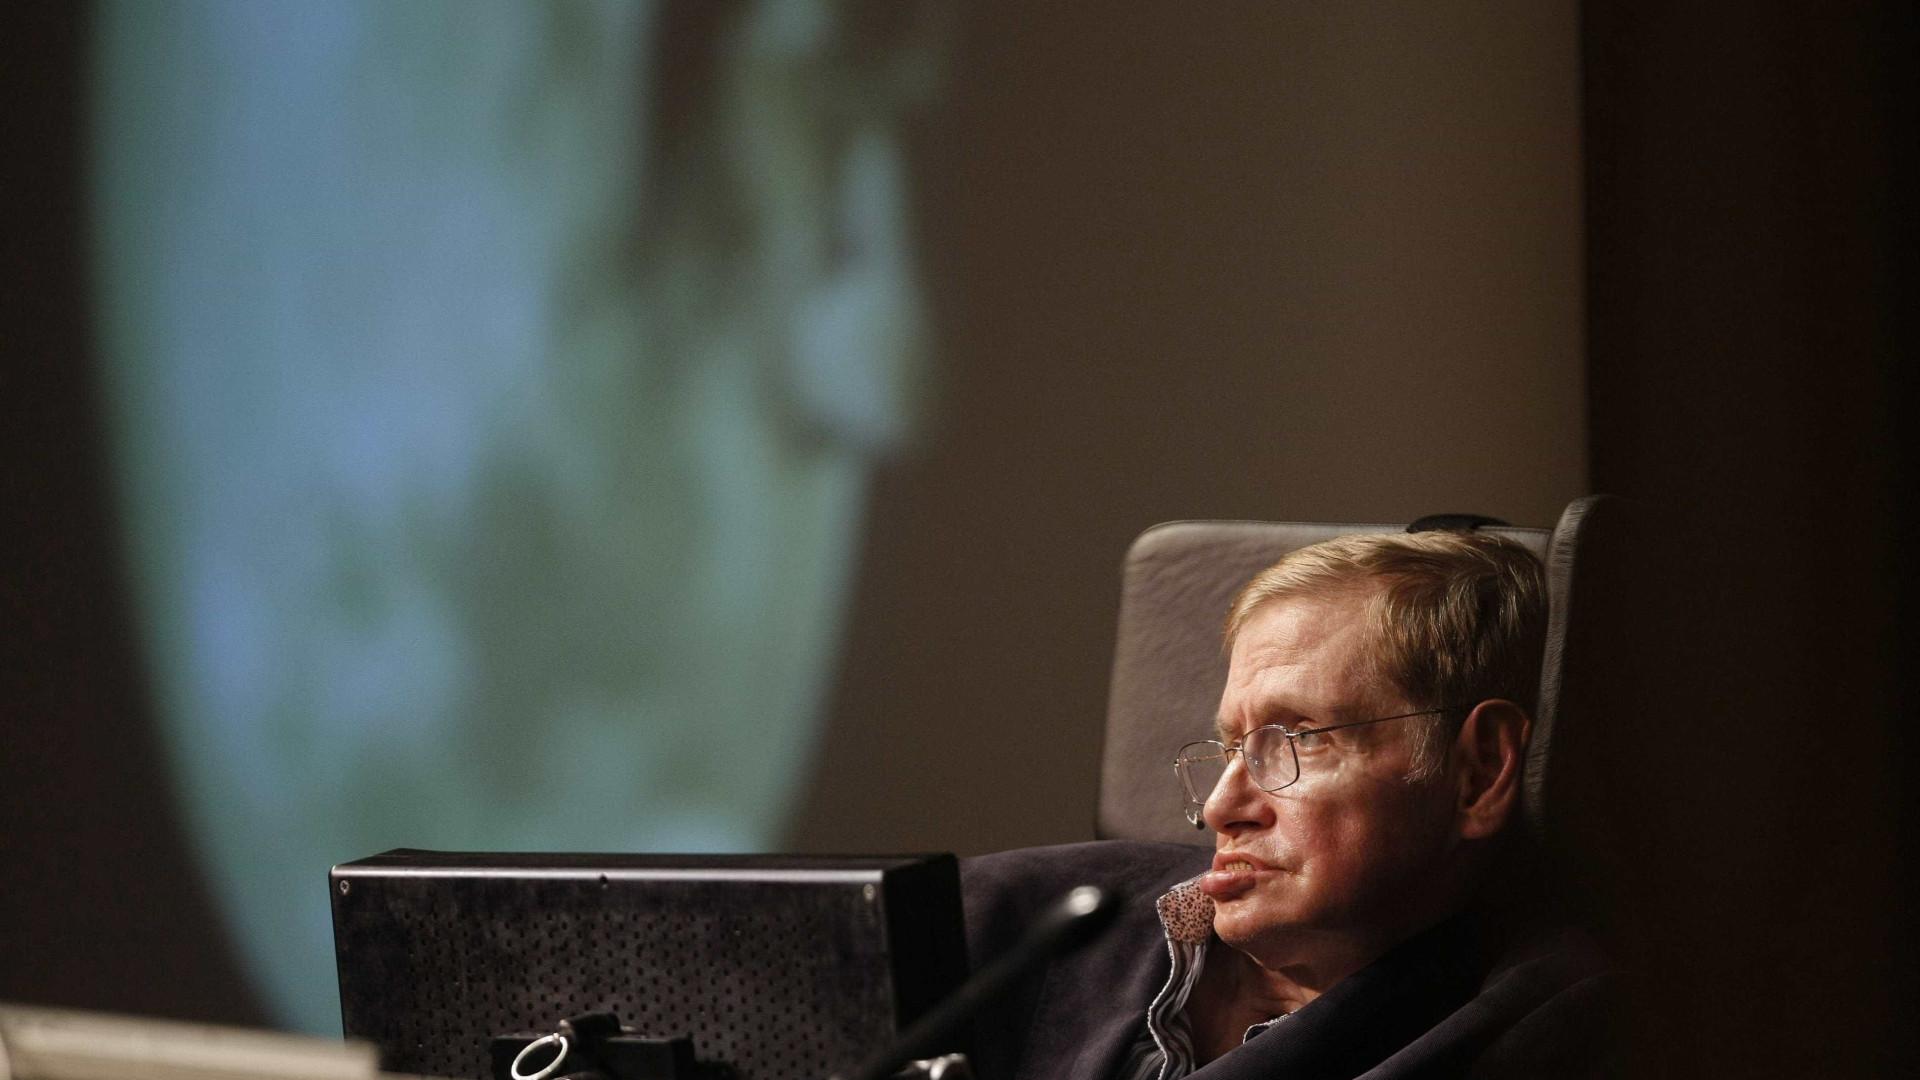 Morre o físico Stephen Hawking, aos 76 anos